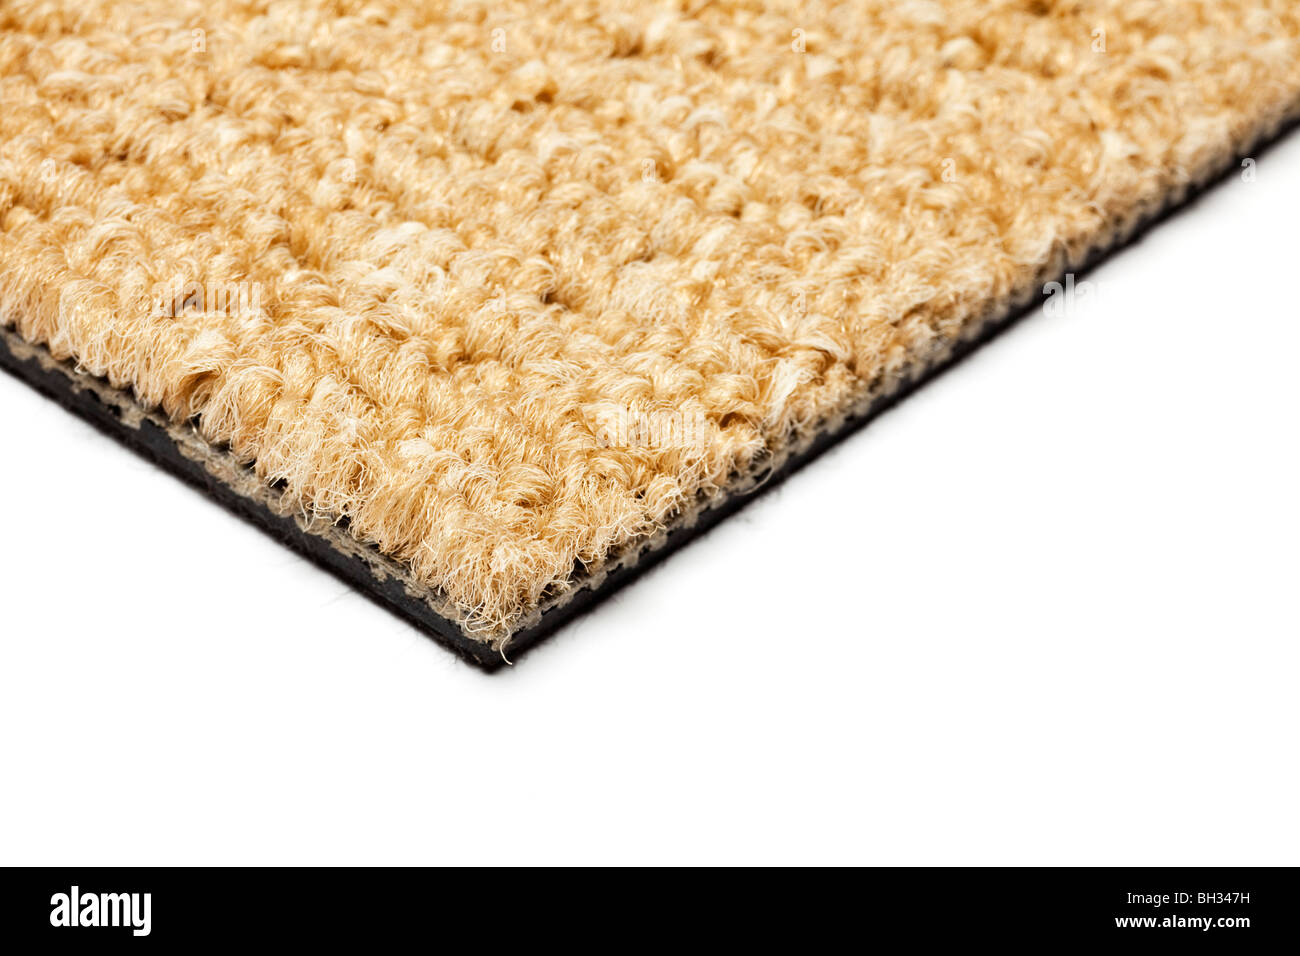 Teppich hautnah selektiven Fokus zeigen Kante Stockbild